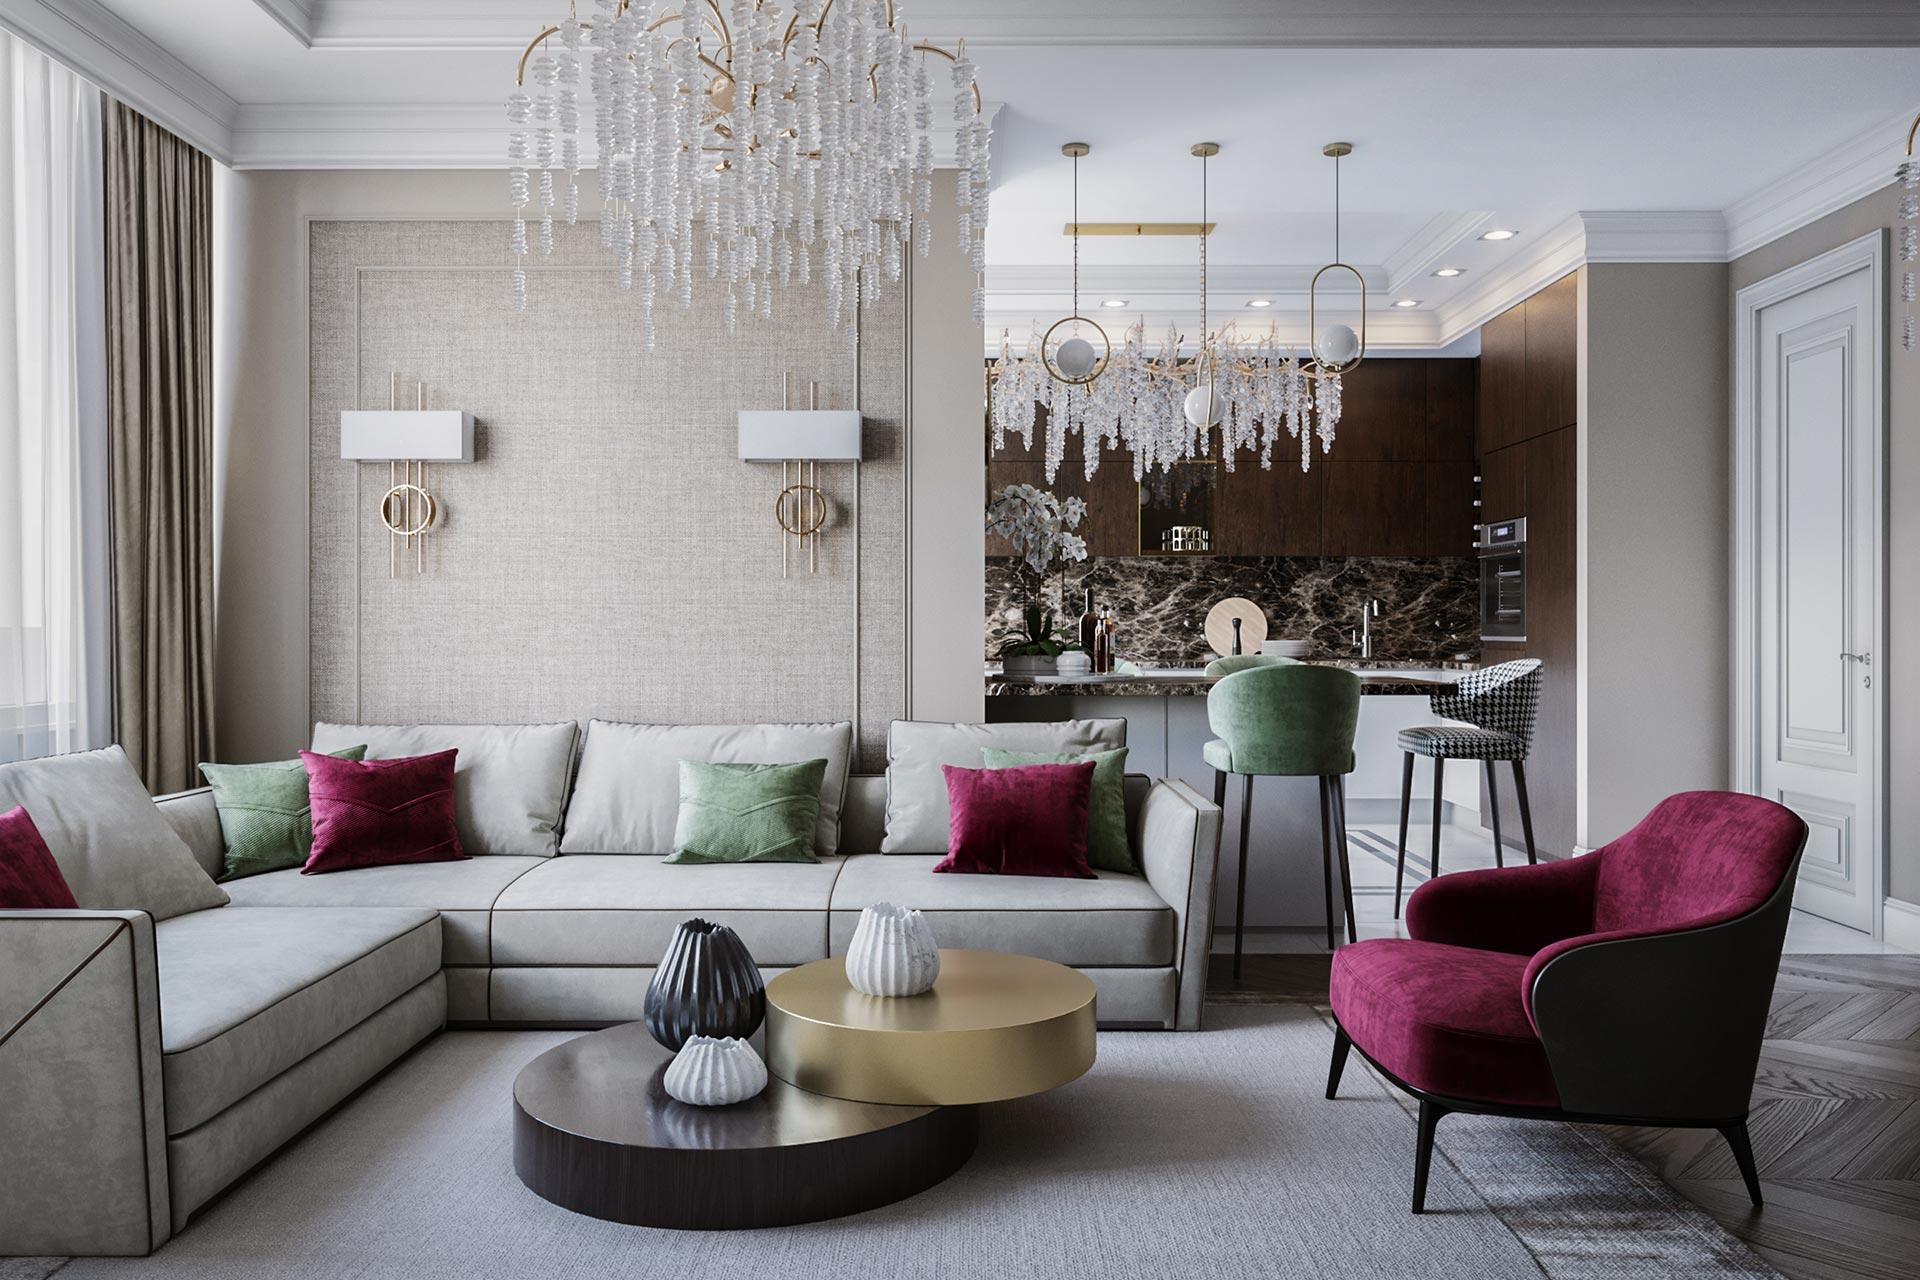 Дизайн интерьера четырехкомнатной квартиры в ЖК Розмарин